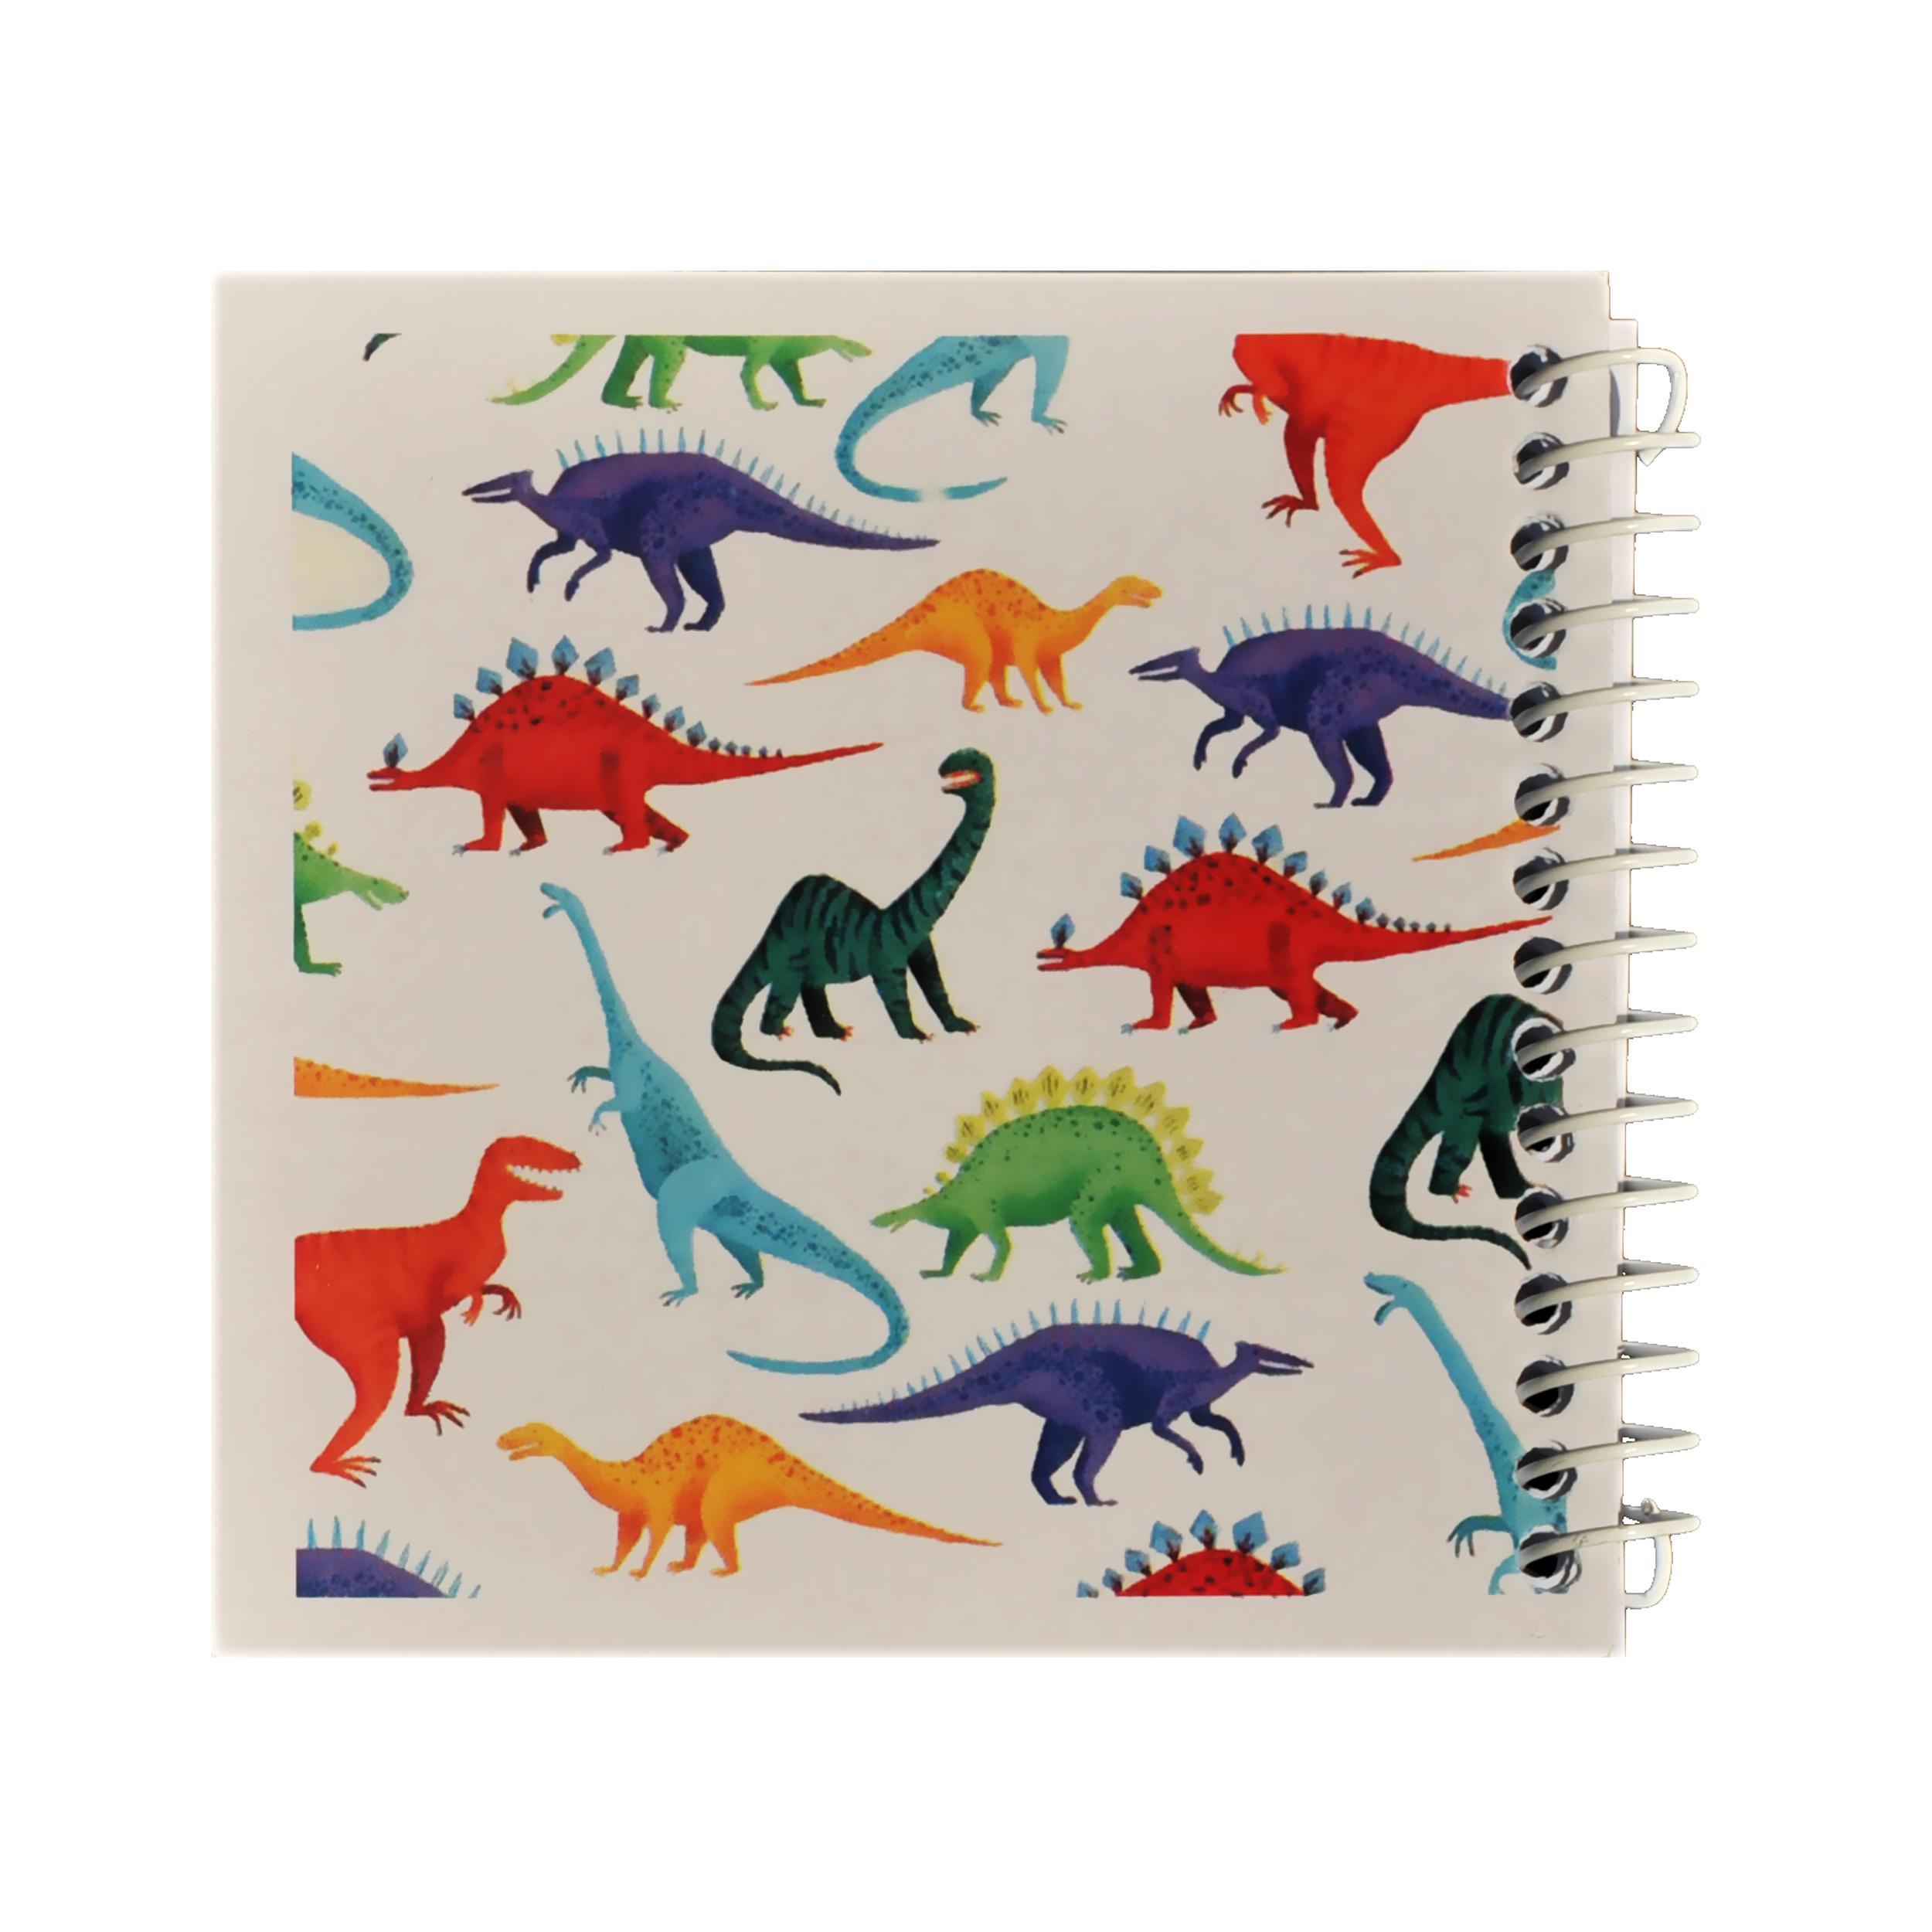 دفتر یادداشت ژوست طرح دایناسور ها مدل کژوال کد ۰۱